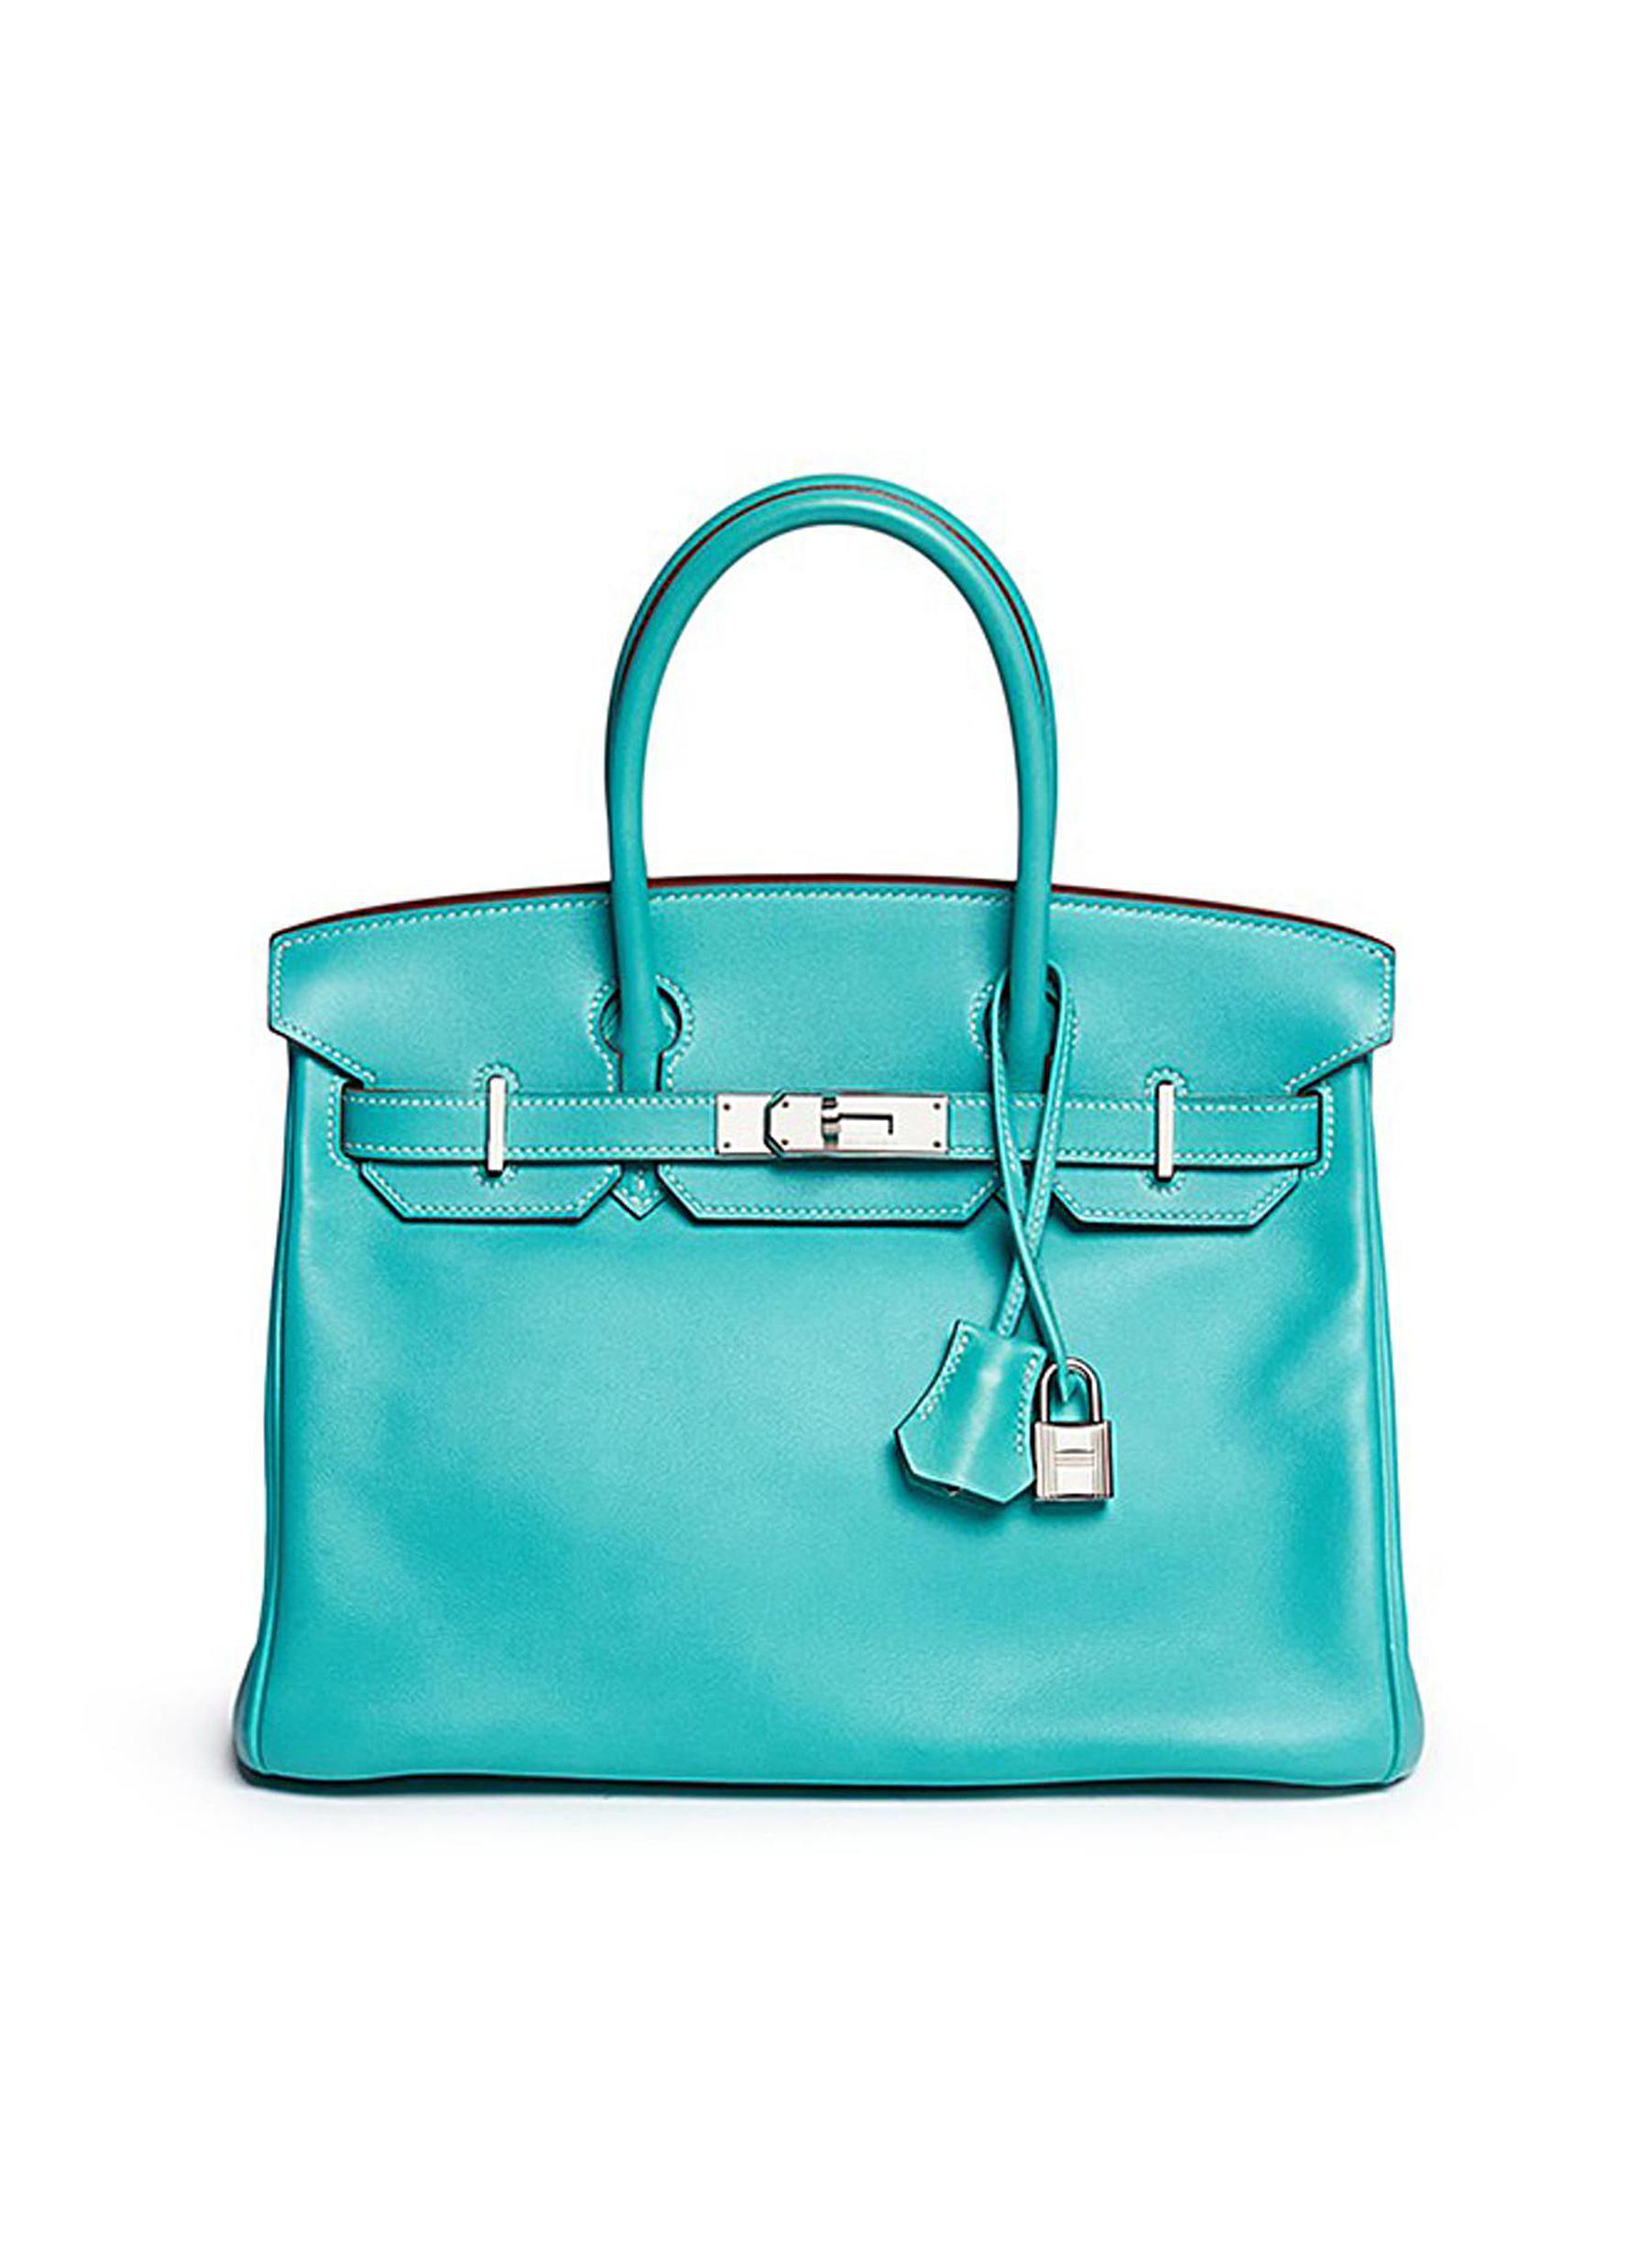 Birkin Lagoon 30cm Swift leather bag - VINTAGE HERMÈS - Modalova